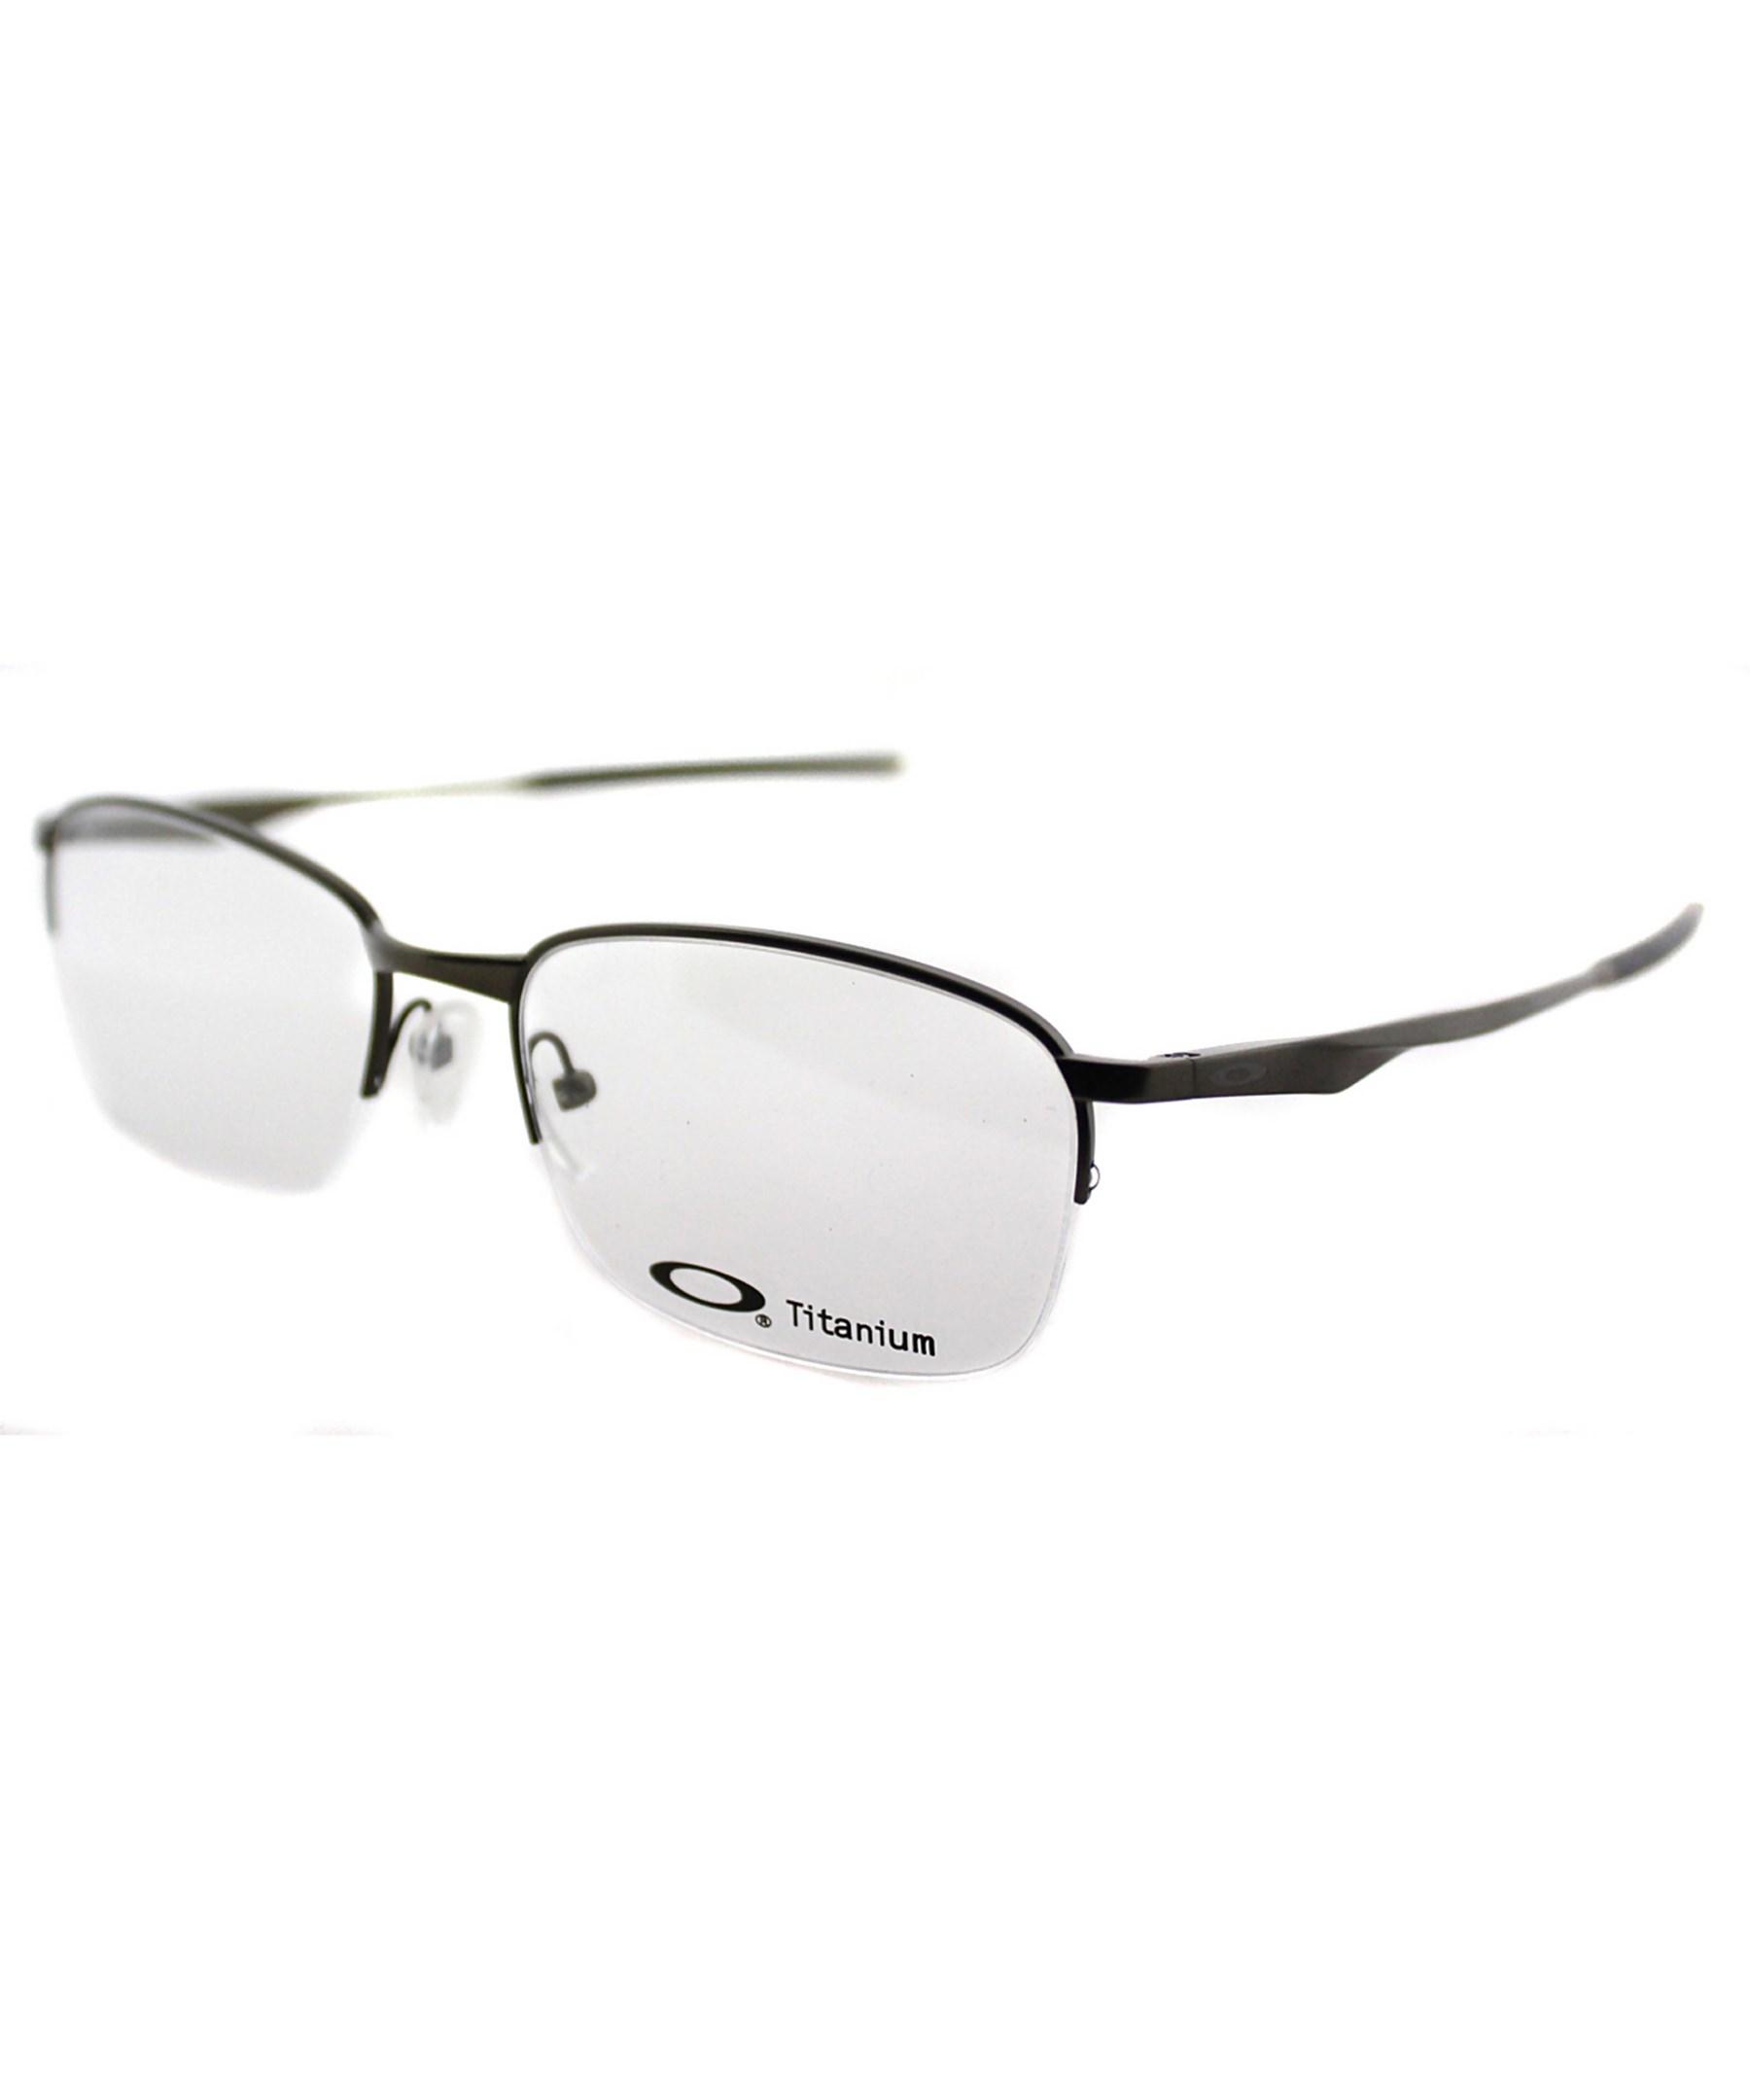 75376b79e4 Oakley Rimless Womens Eyeglasses « Heritage Malta